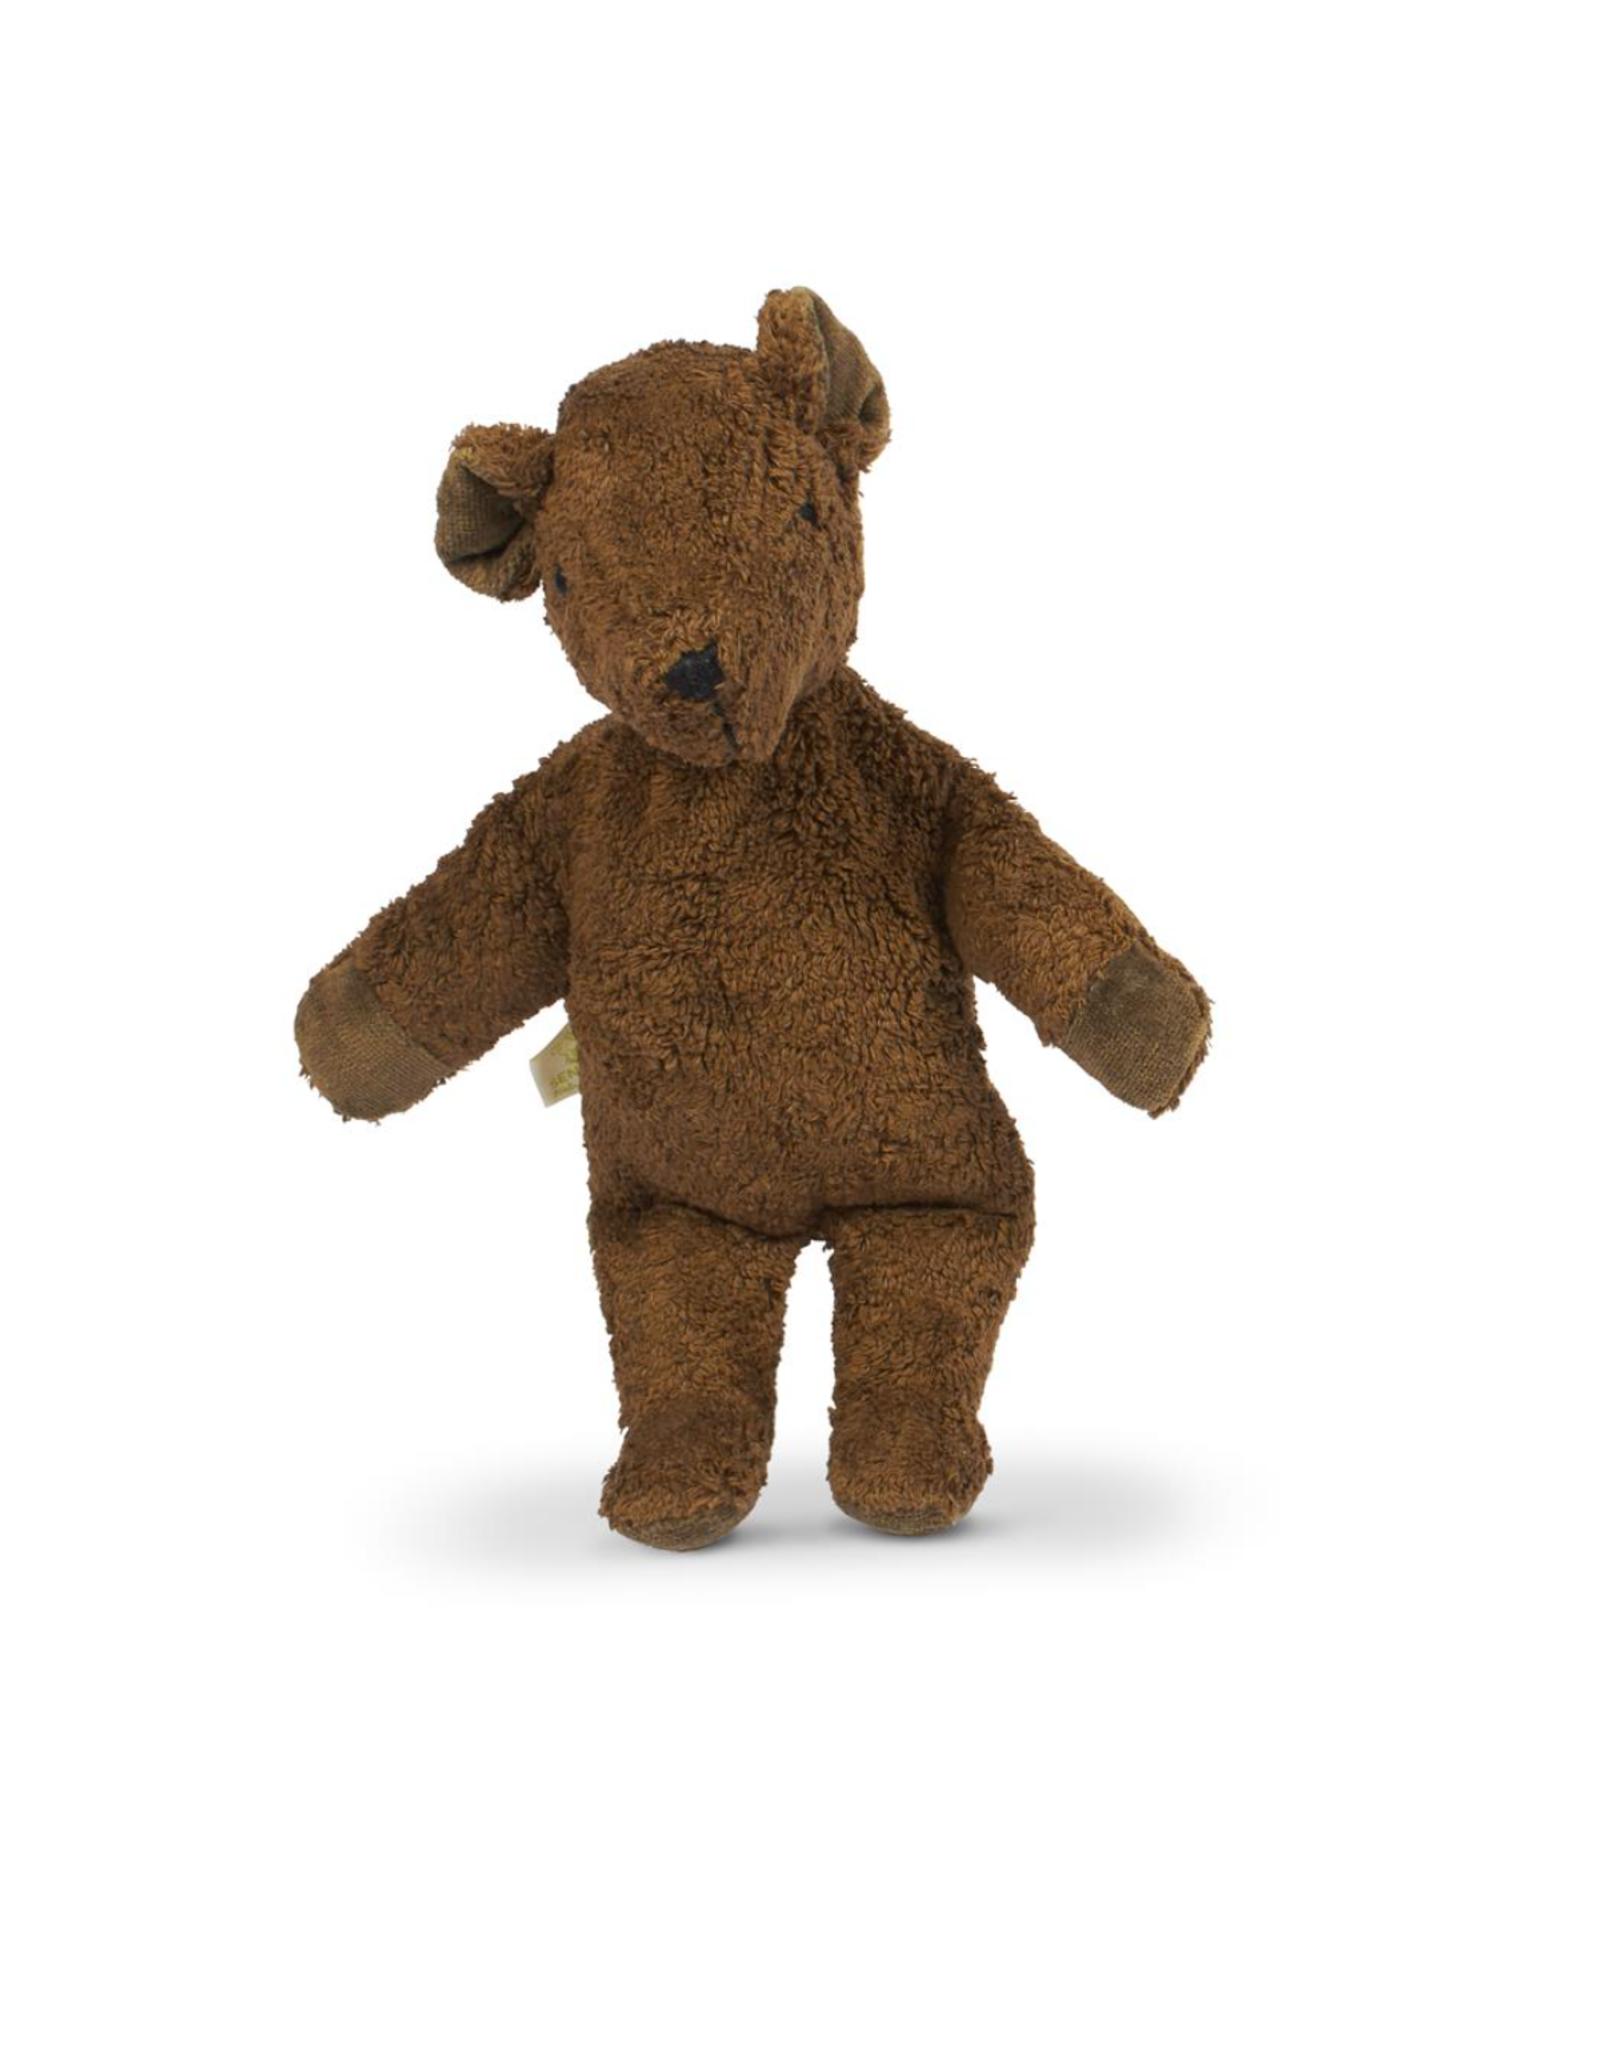 Senger Naturwelt Bear the Cuddly Animal